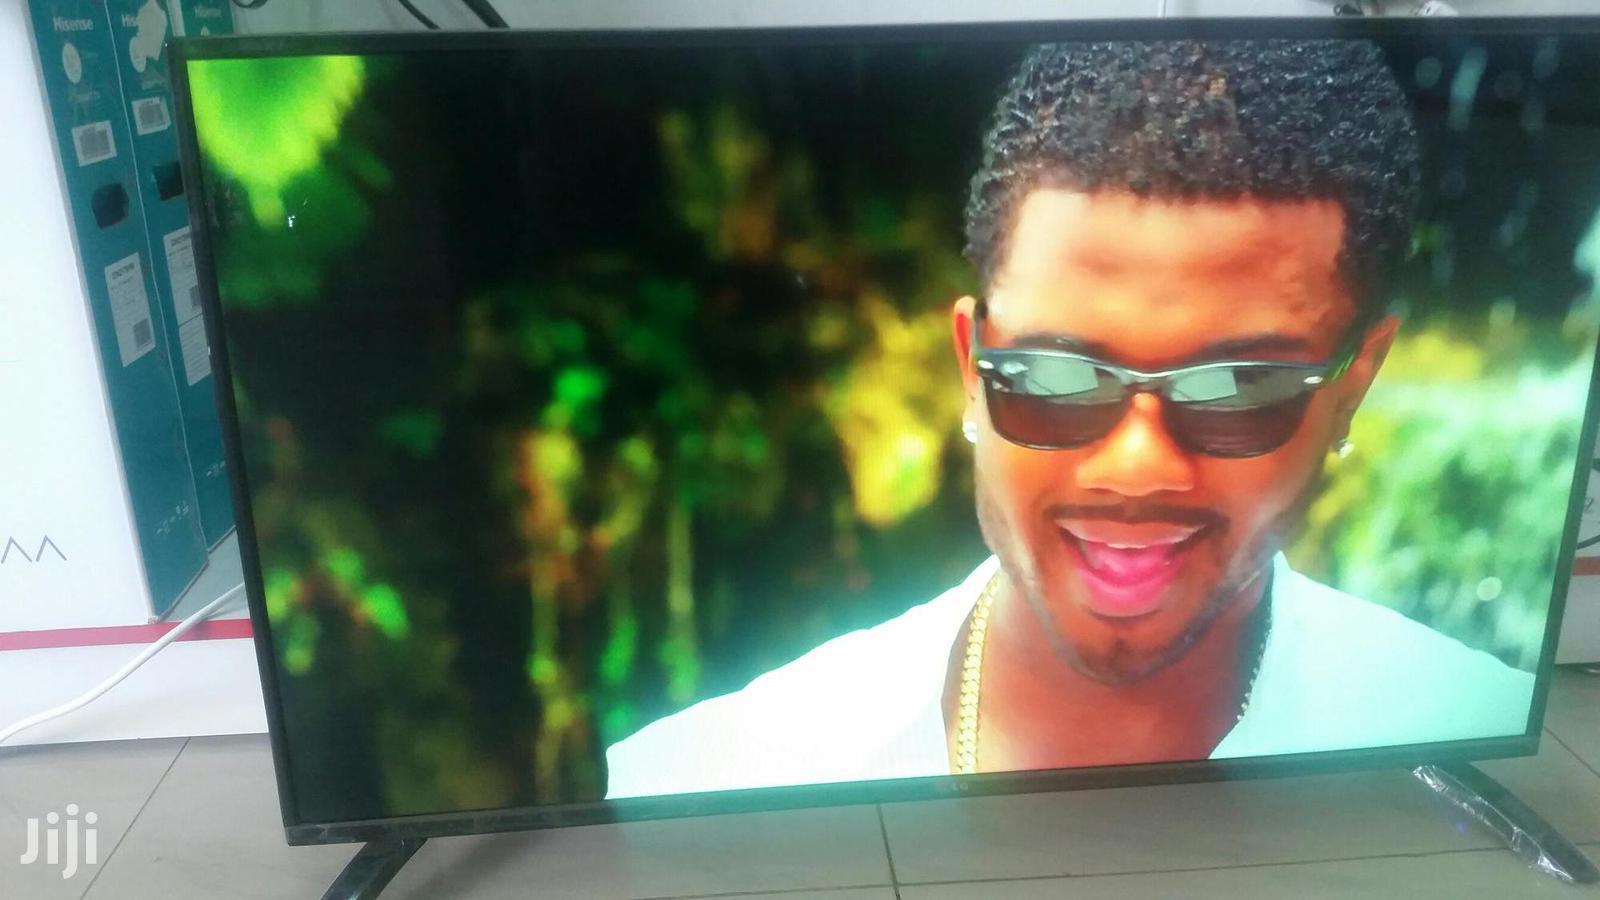 LG Flat Screen TV 43 Inches